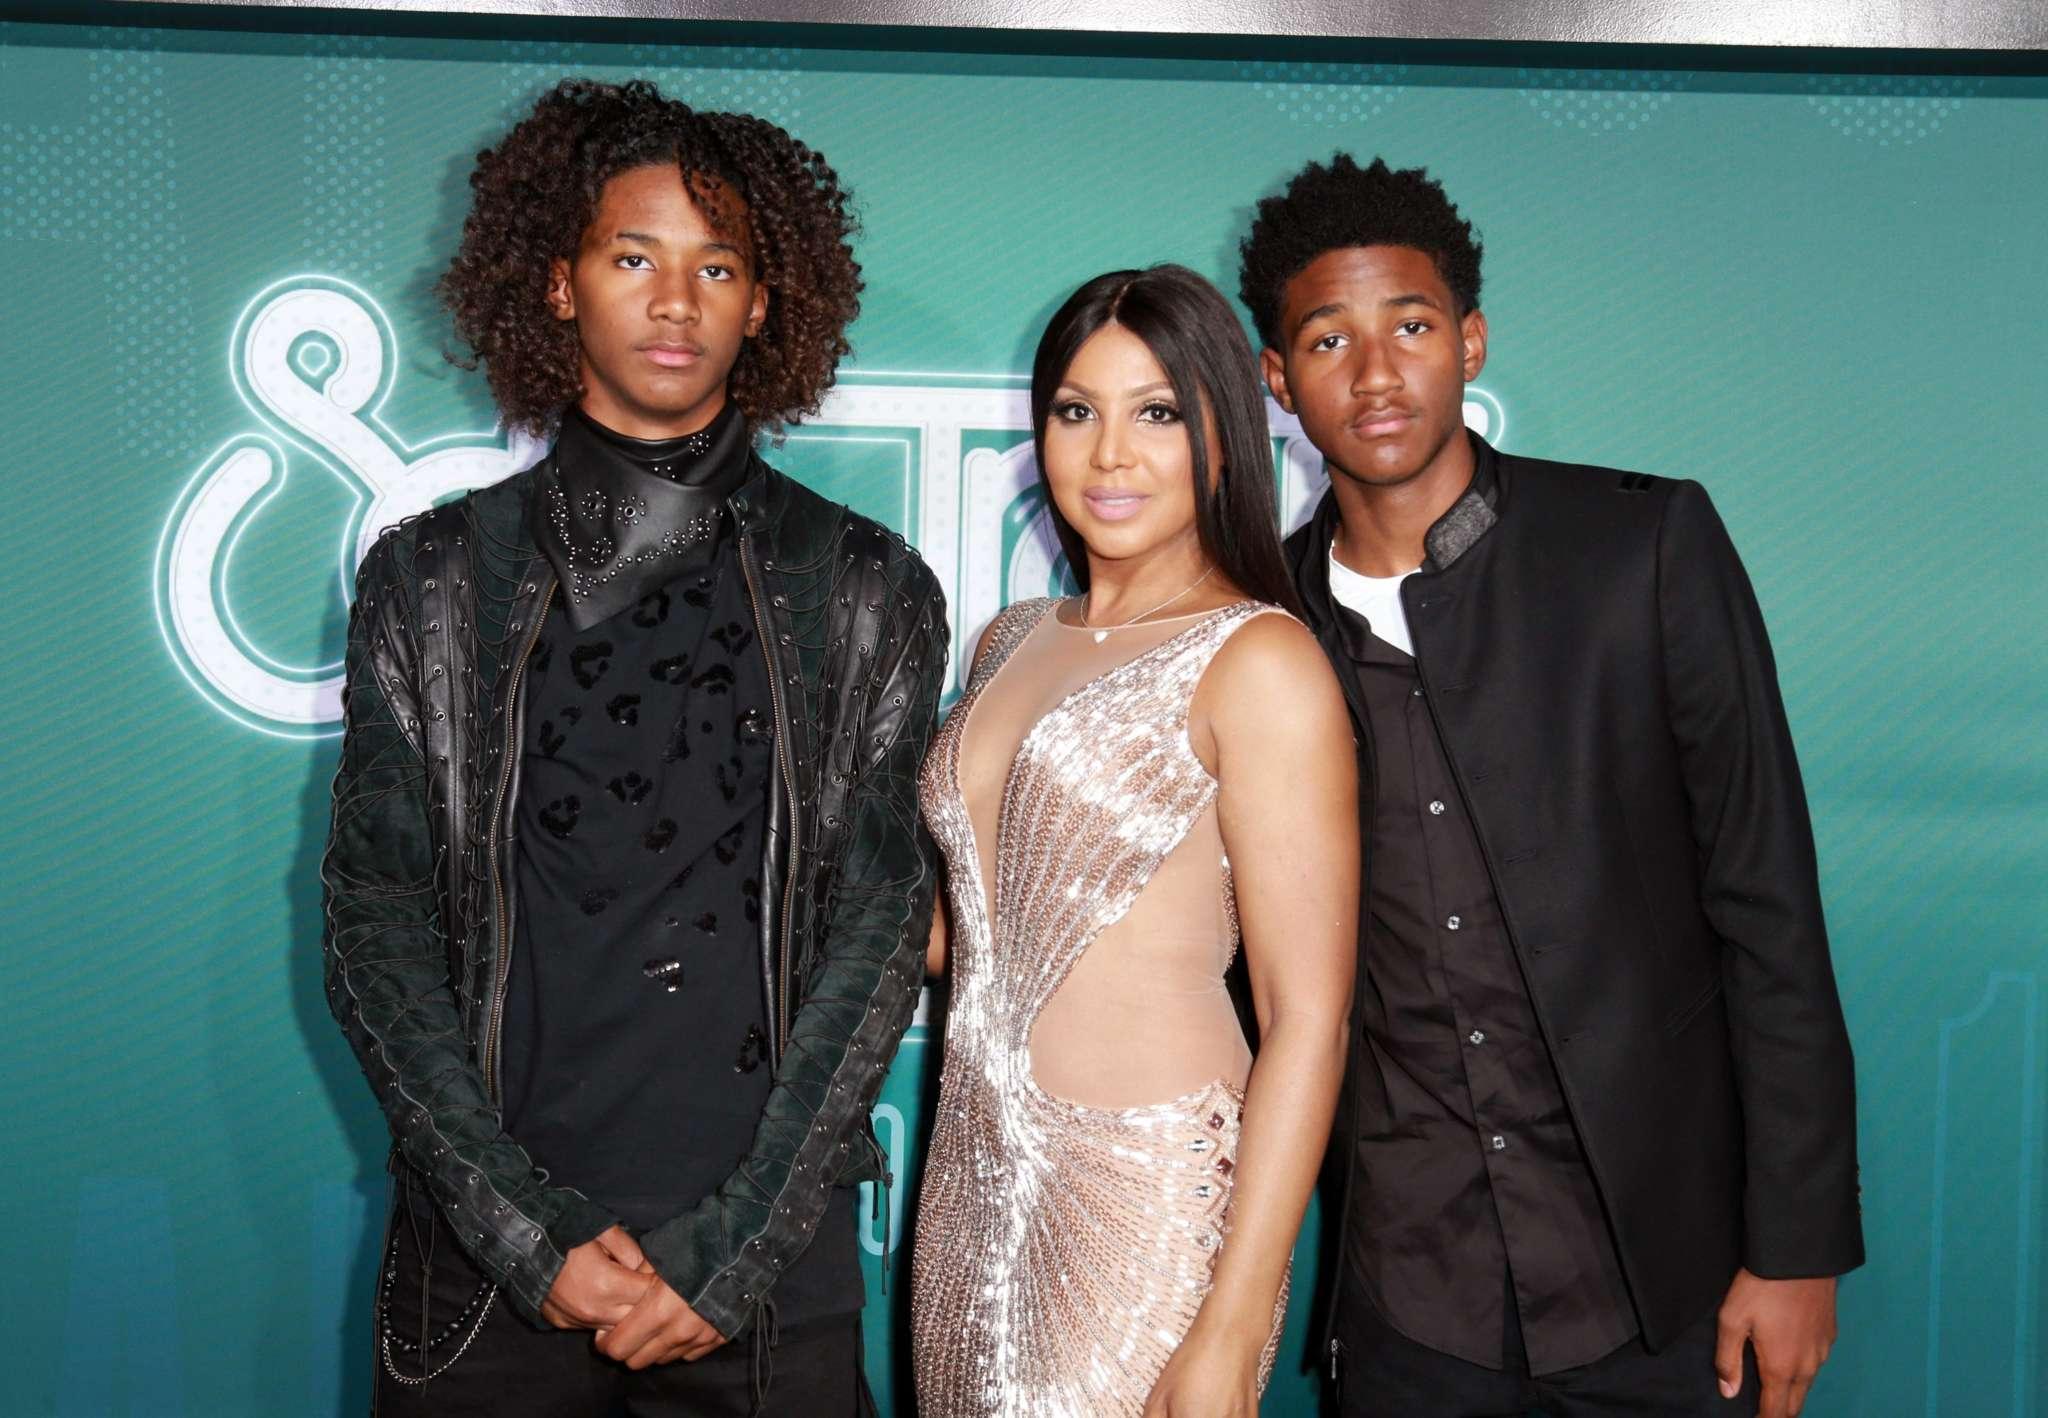 Toni Braxton Praises Her Son, Denim Kole Braxton Lewis - He Just Graduated!